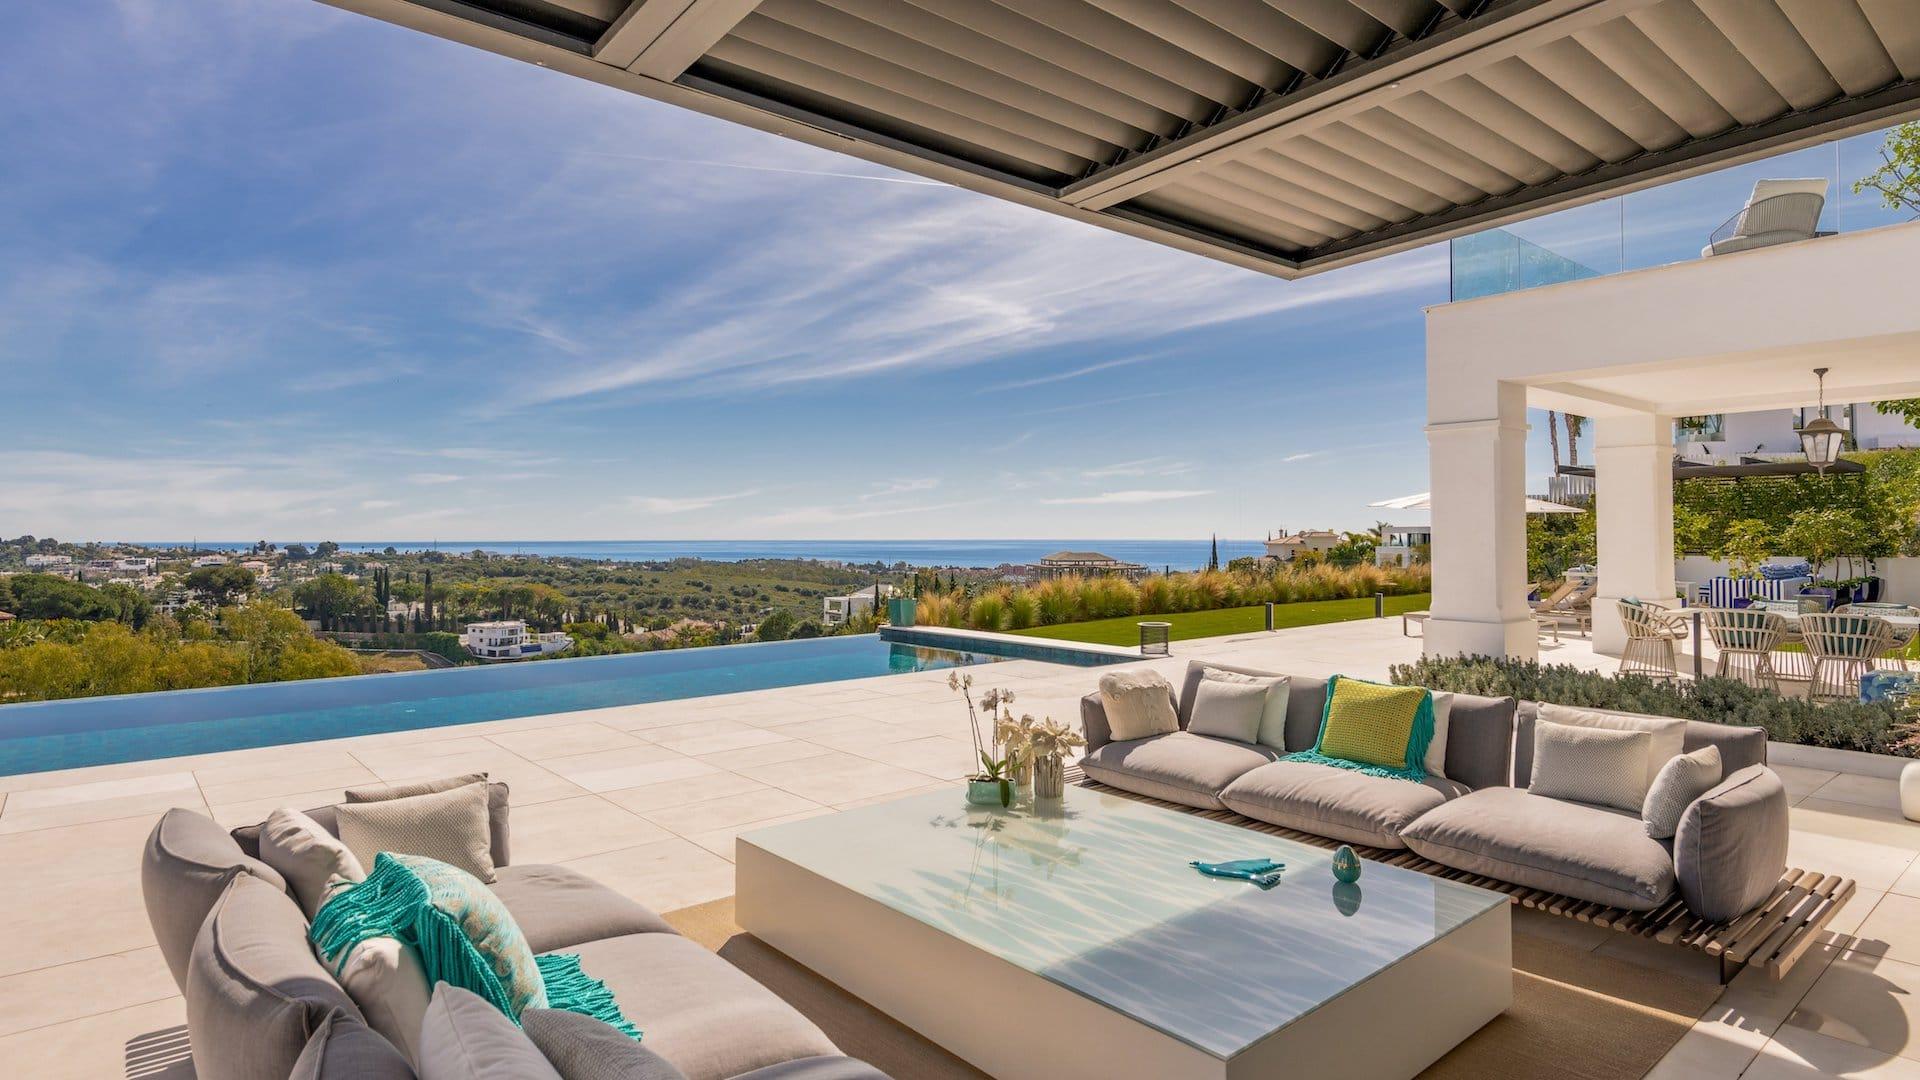 Villa in Marbella, panoramic view